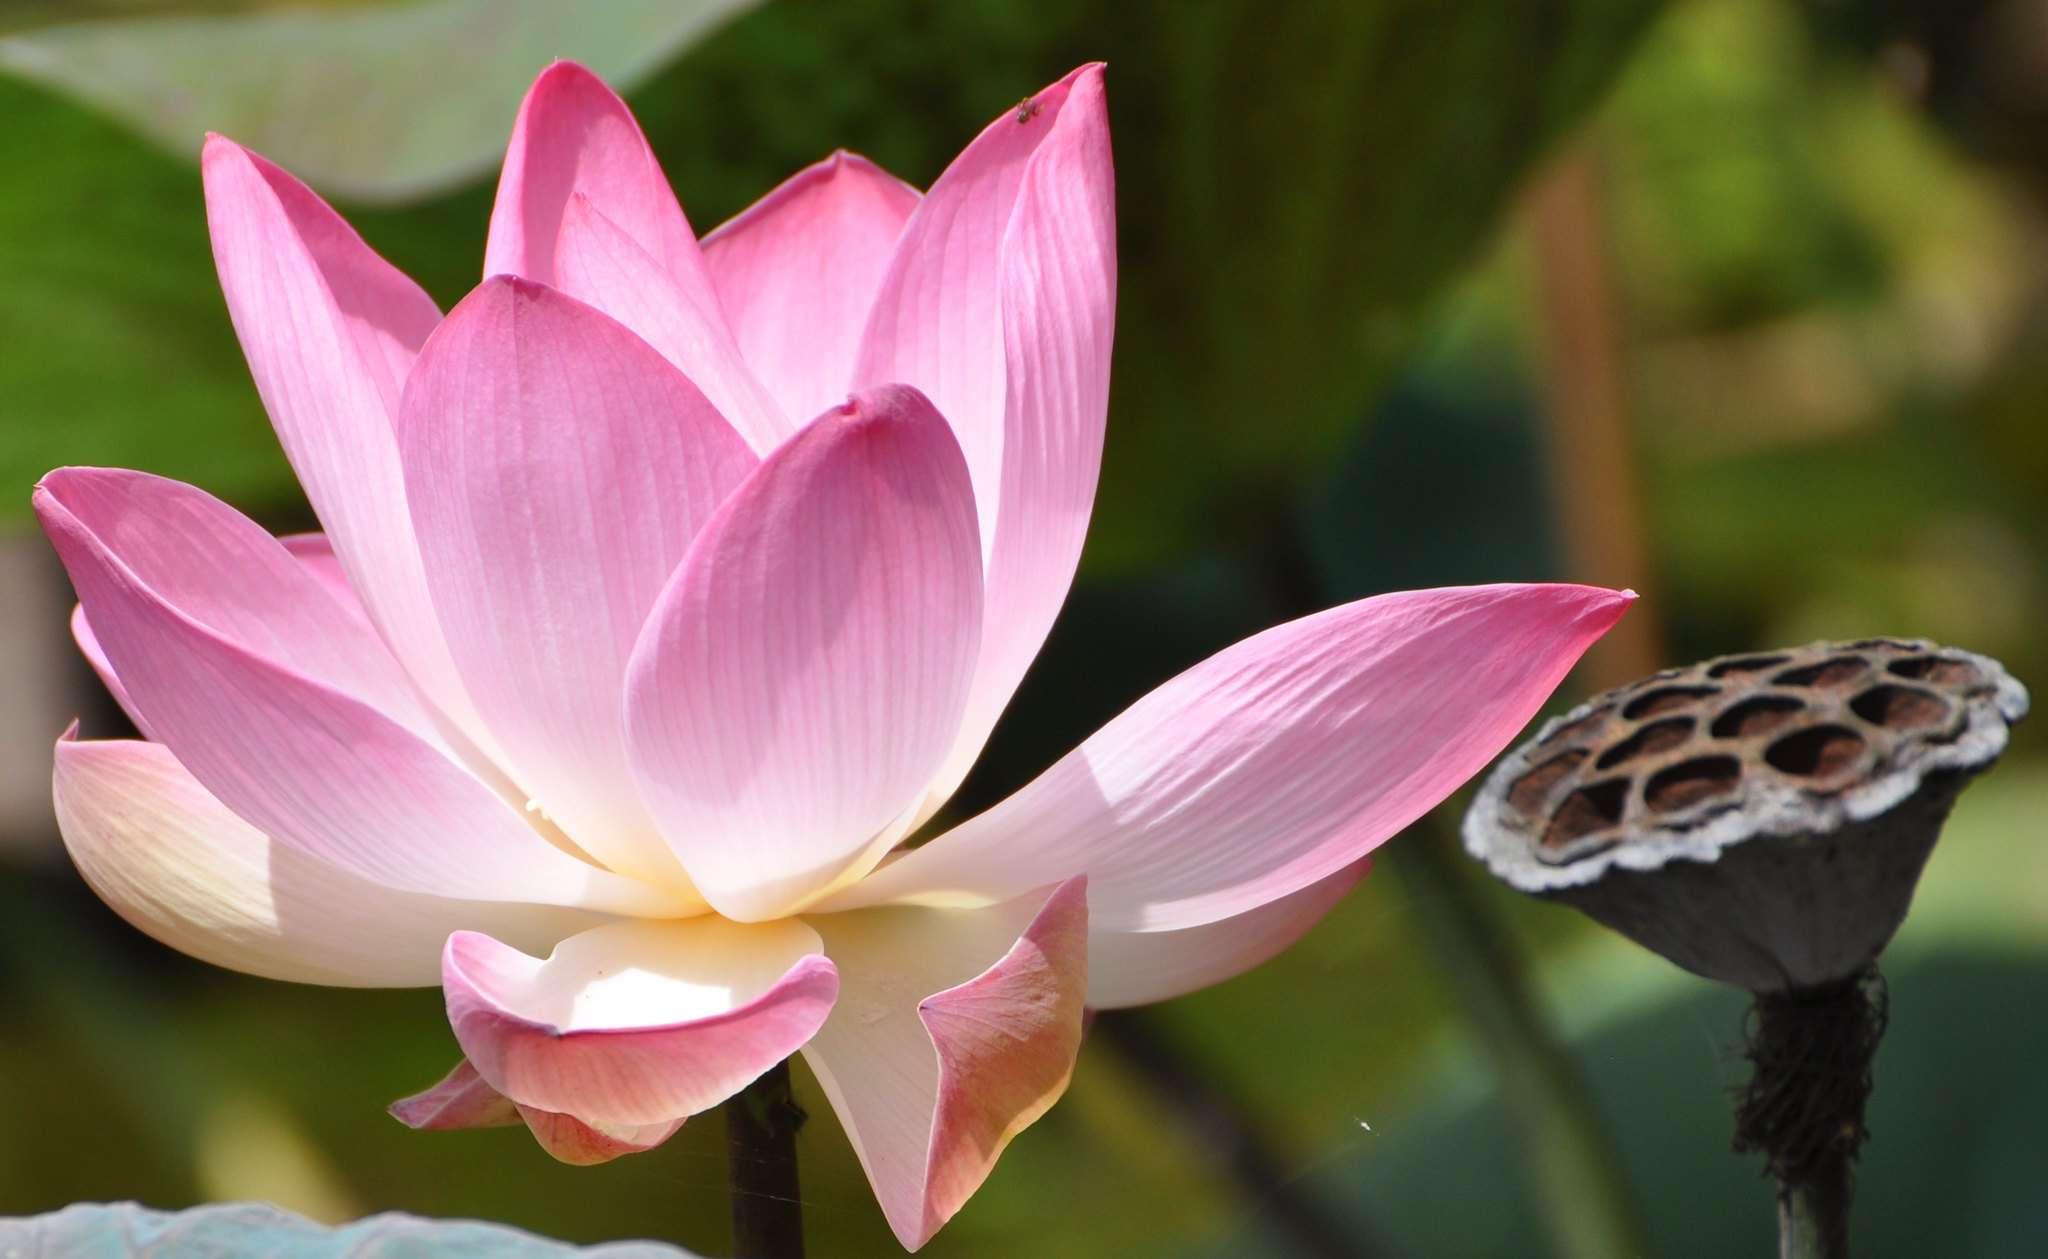 Sacred lotus (Nelumbo nucifera) flower and dried pod